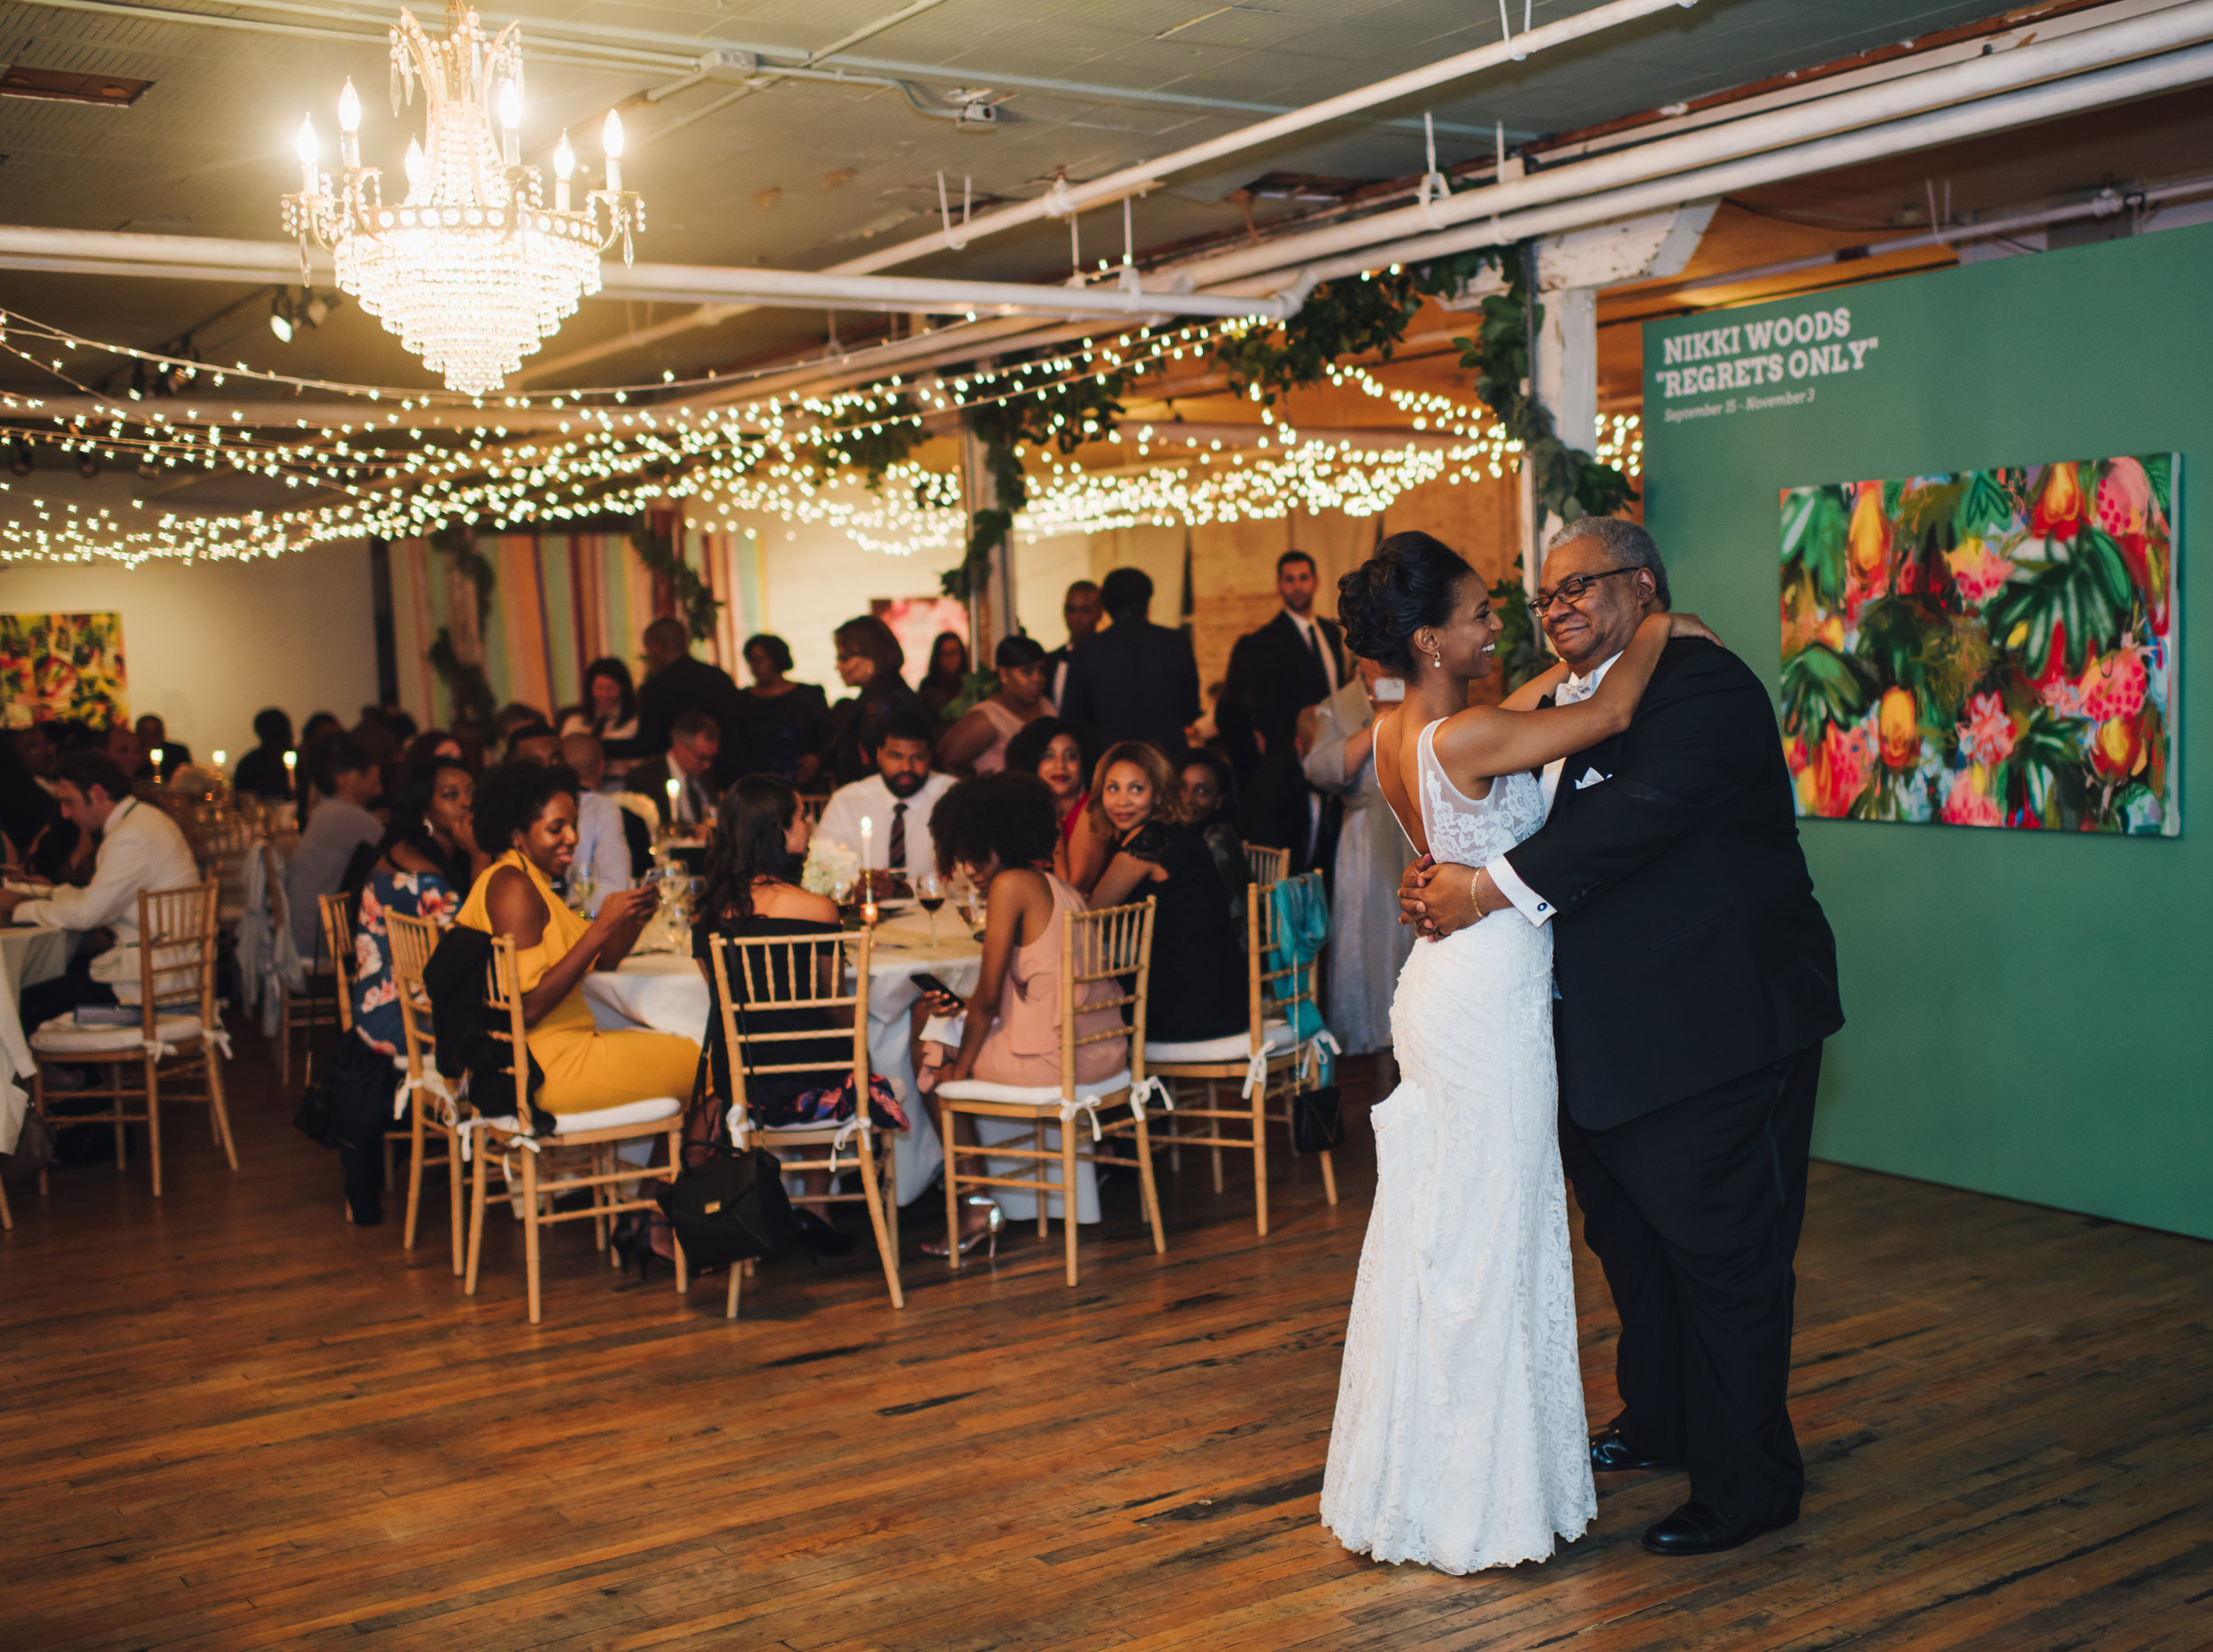 DANIELLE & BRANDON WEDDING - HEDGE ART GALLERY - NYC INTIMATE WEDDING PHOTOGRAPHER - CHI-CHI ARI-427.jpg